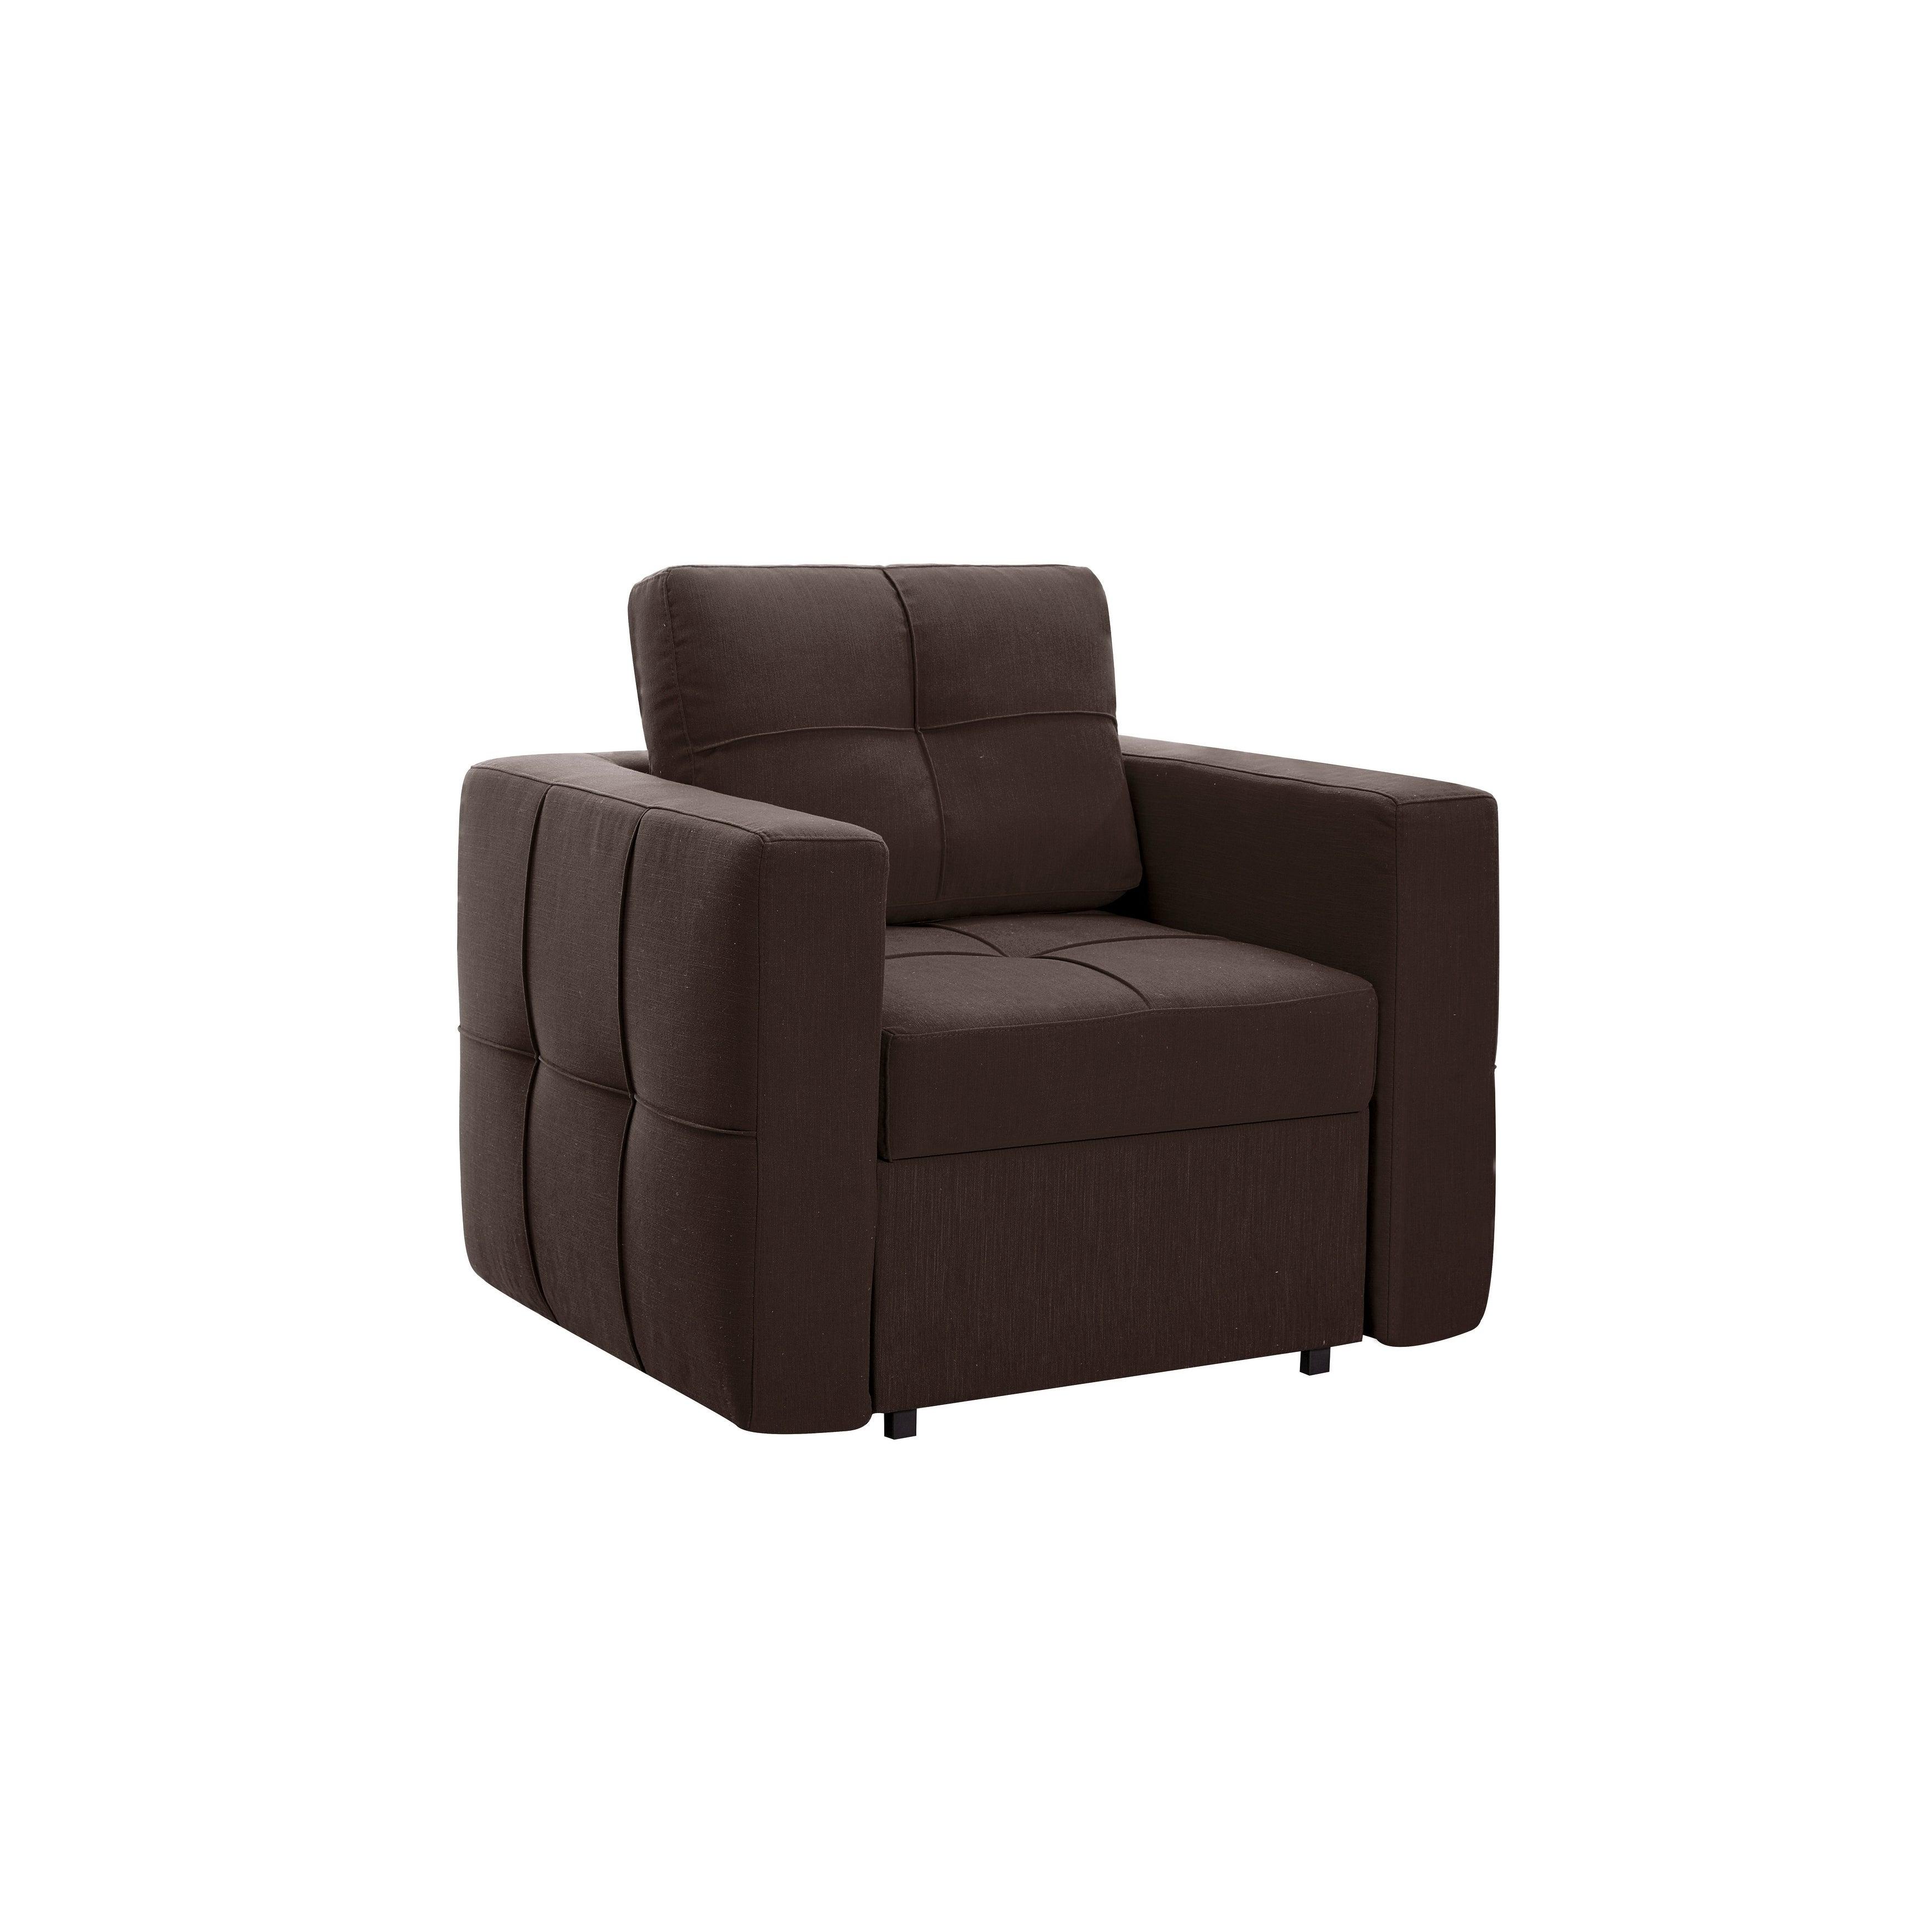 Serta Bakersfield Dream Java Convertible Sofa (Brown - Fabric)